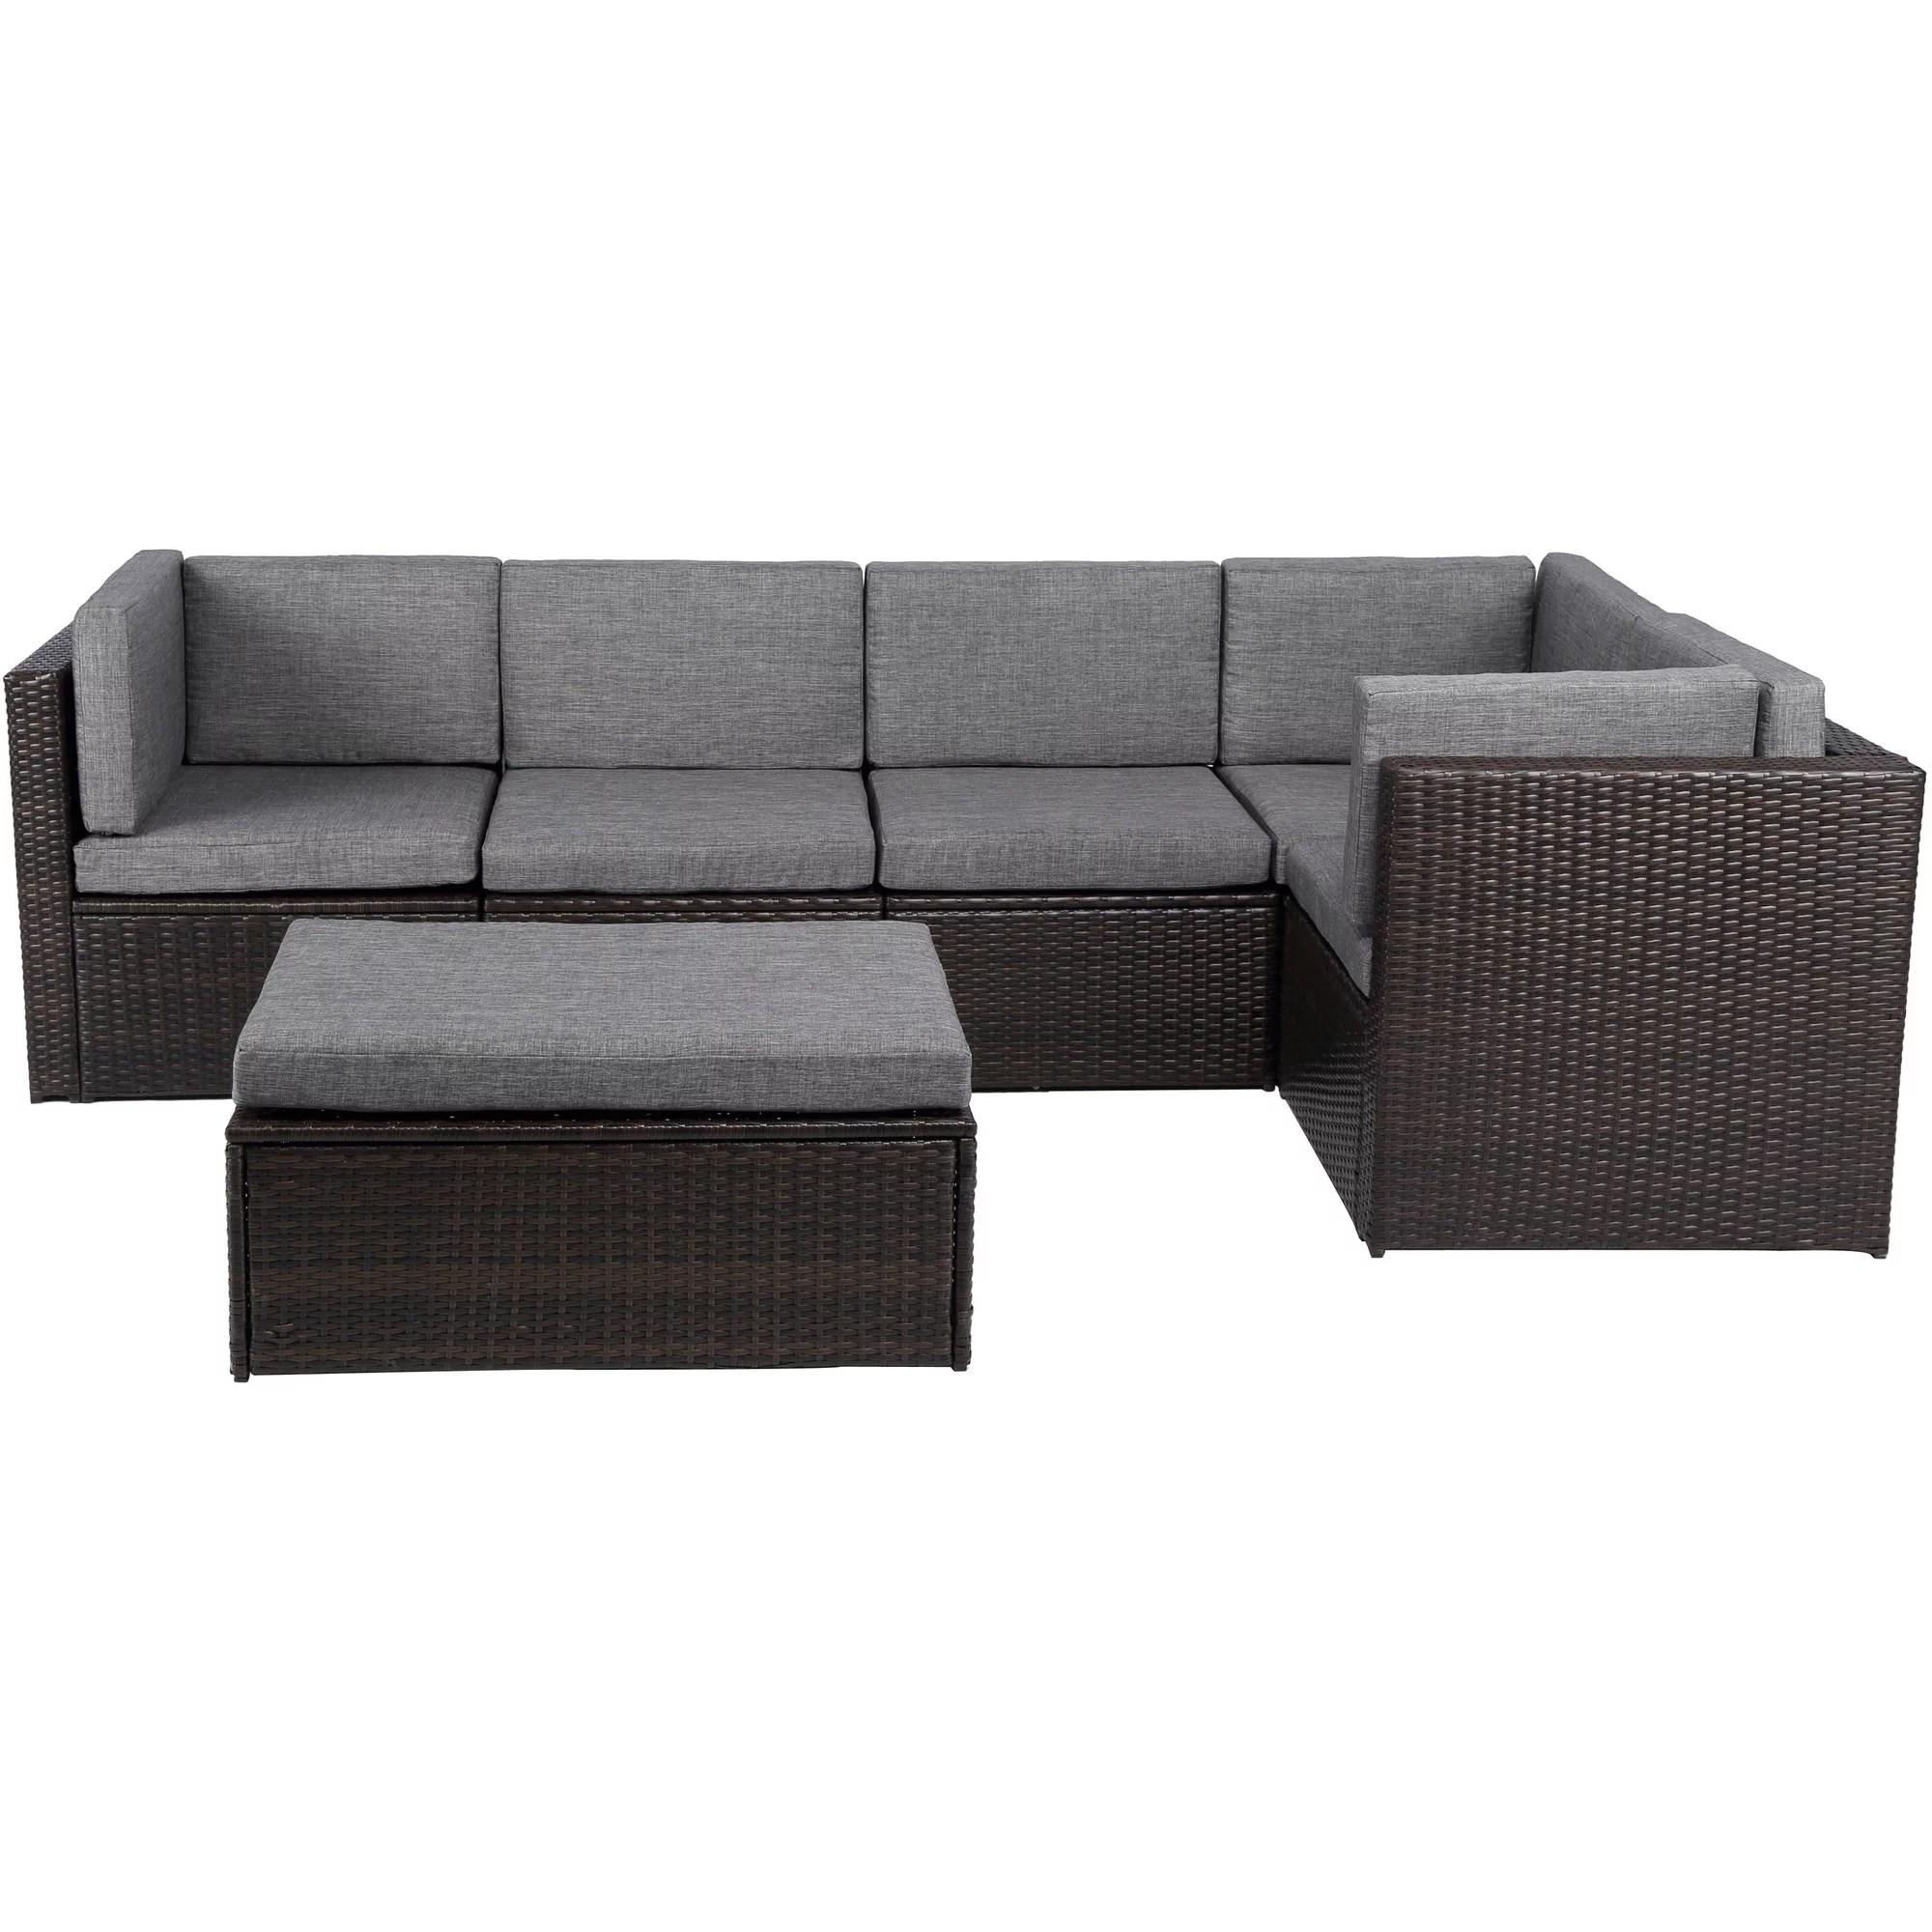 baner garden outdoor furniture complete patio pe wicker rattan garden corner sofa couch set with gray cushions